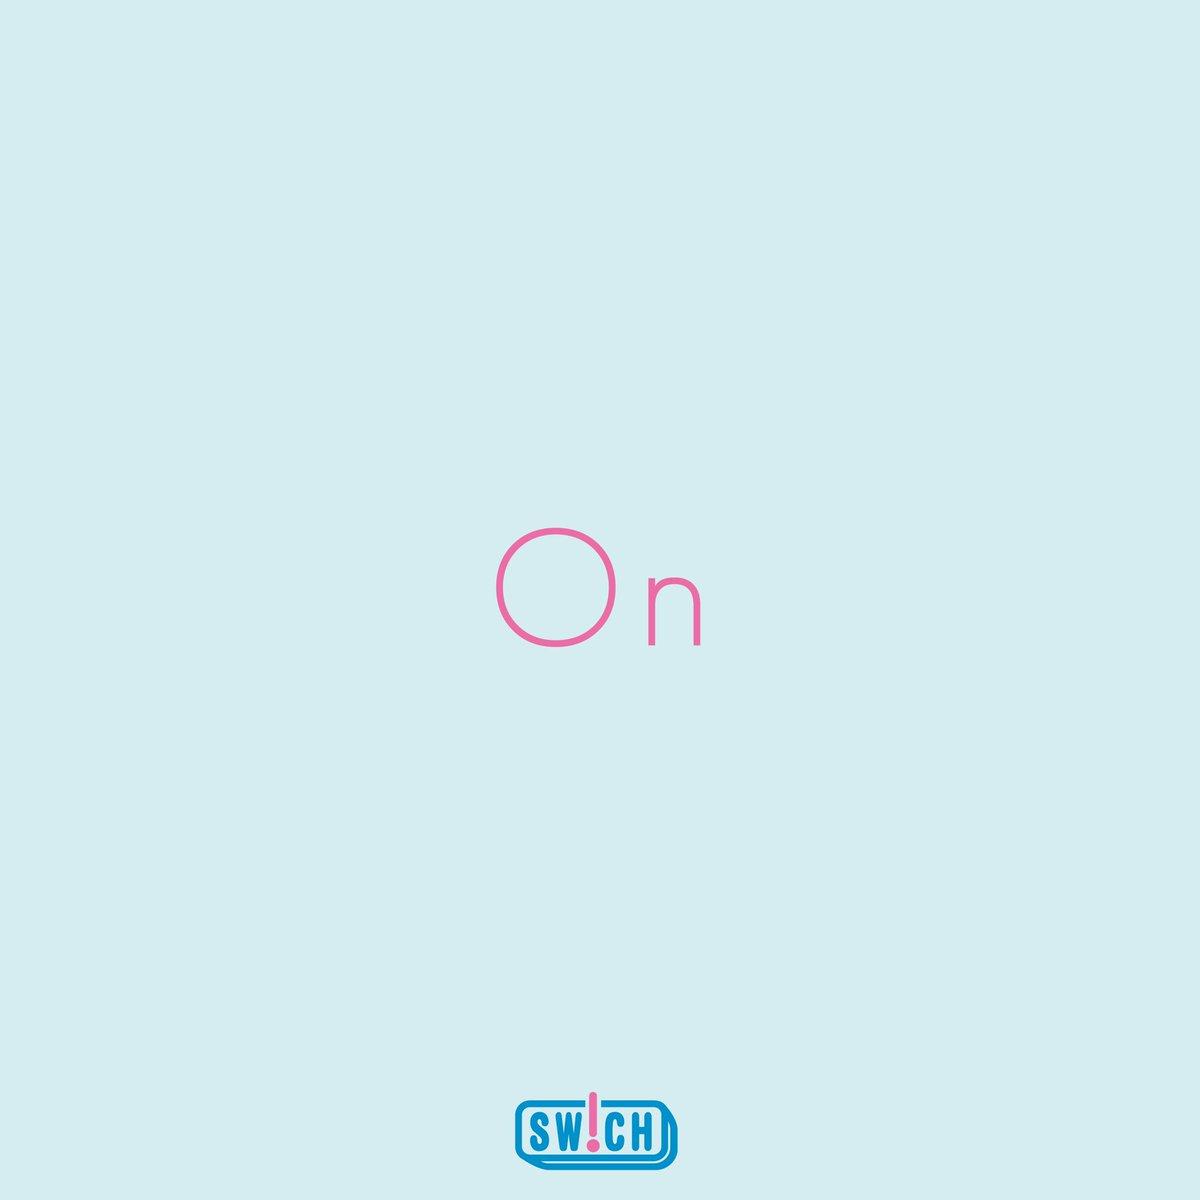 💿SW!CH楽曲配信中💿『On』『Off』はSpotify、Apple Music、LINE MUSICやGoogle Play他各種サービス配信されてます🙌Apple MusicSpotifyLINE MUSICGoogle Play